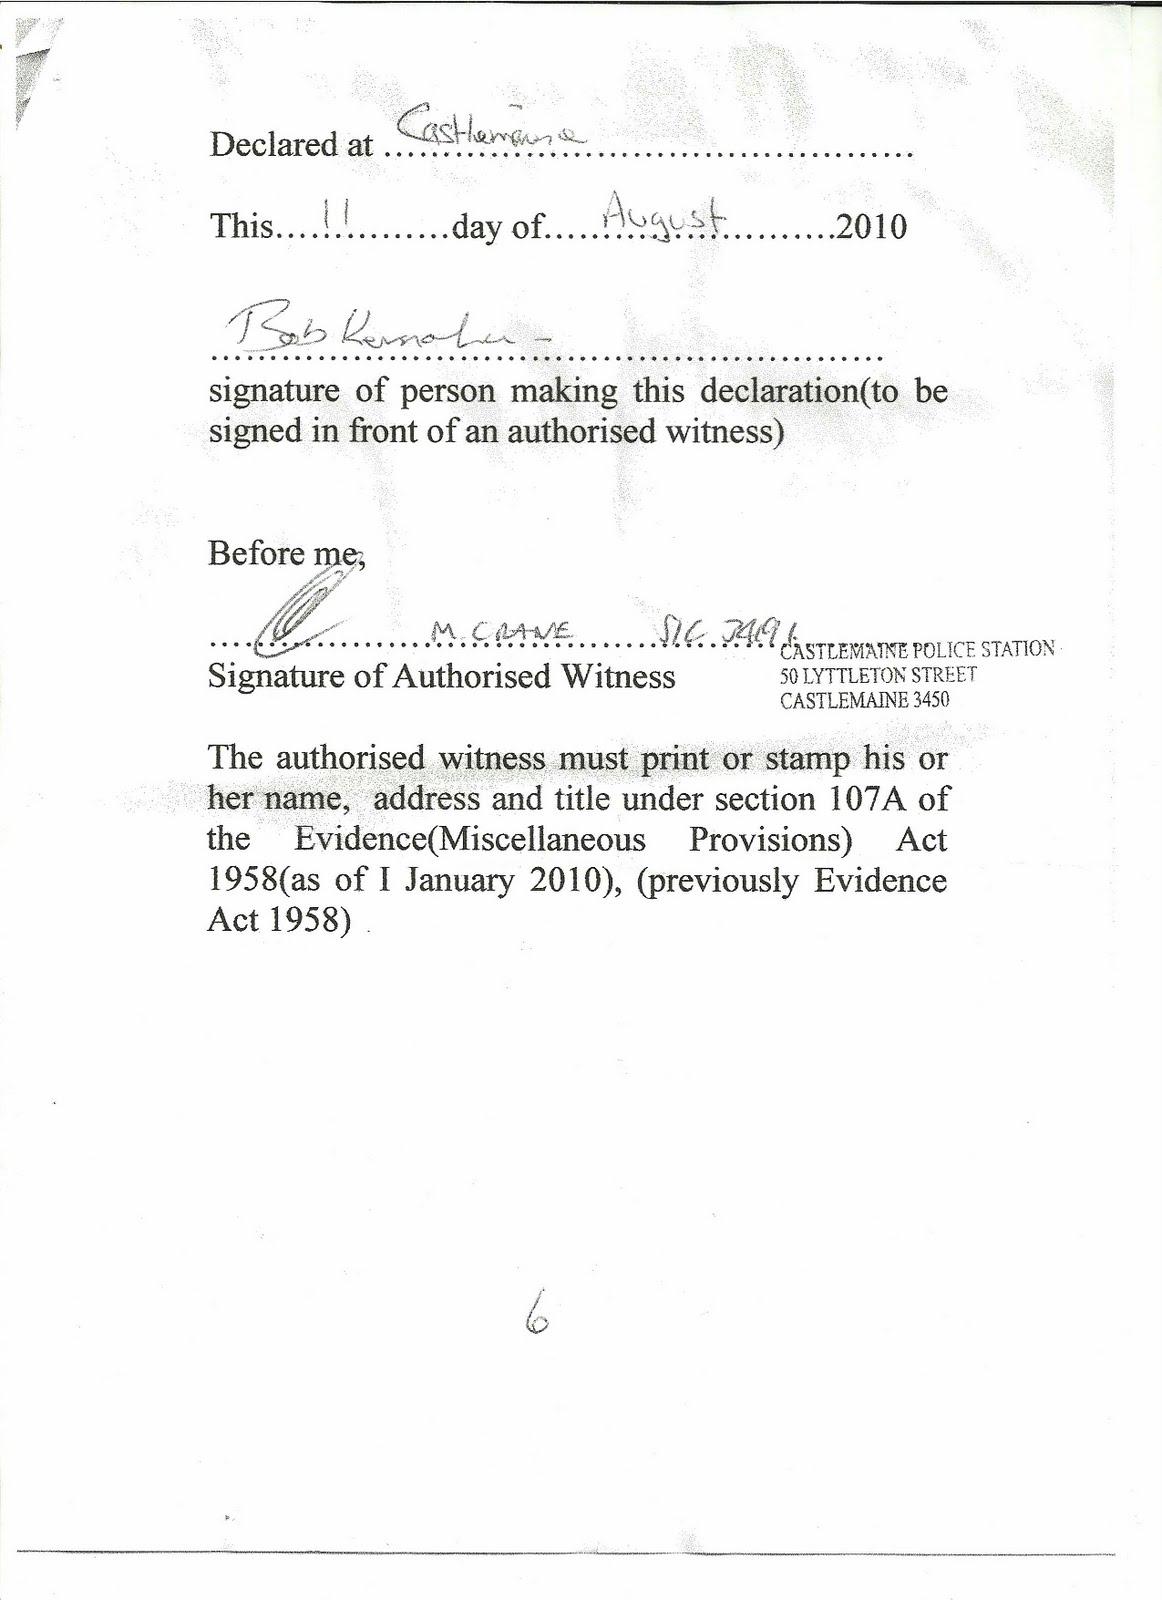 Affidavits and statutory declarations